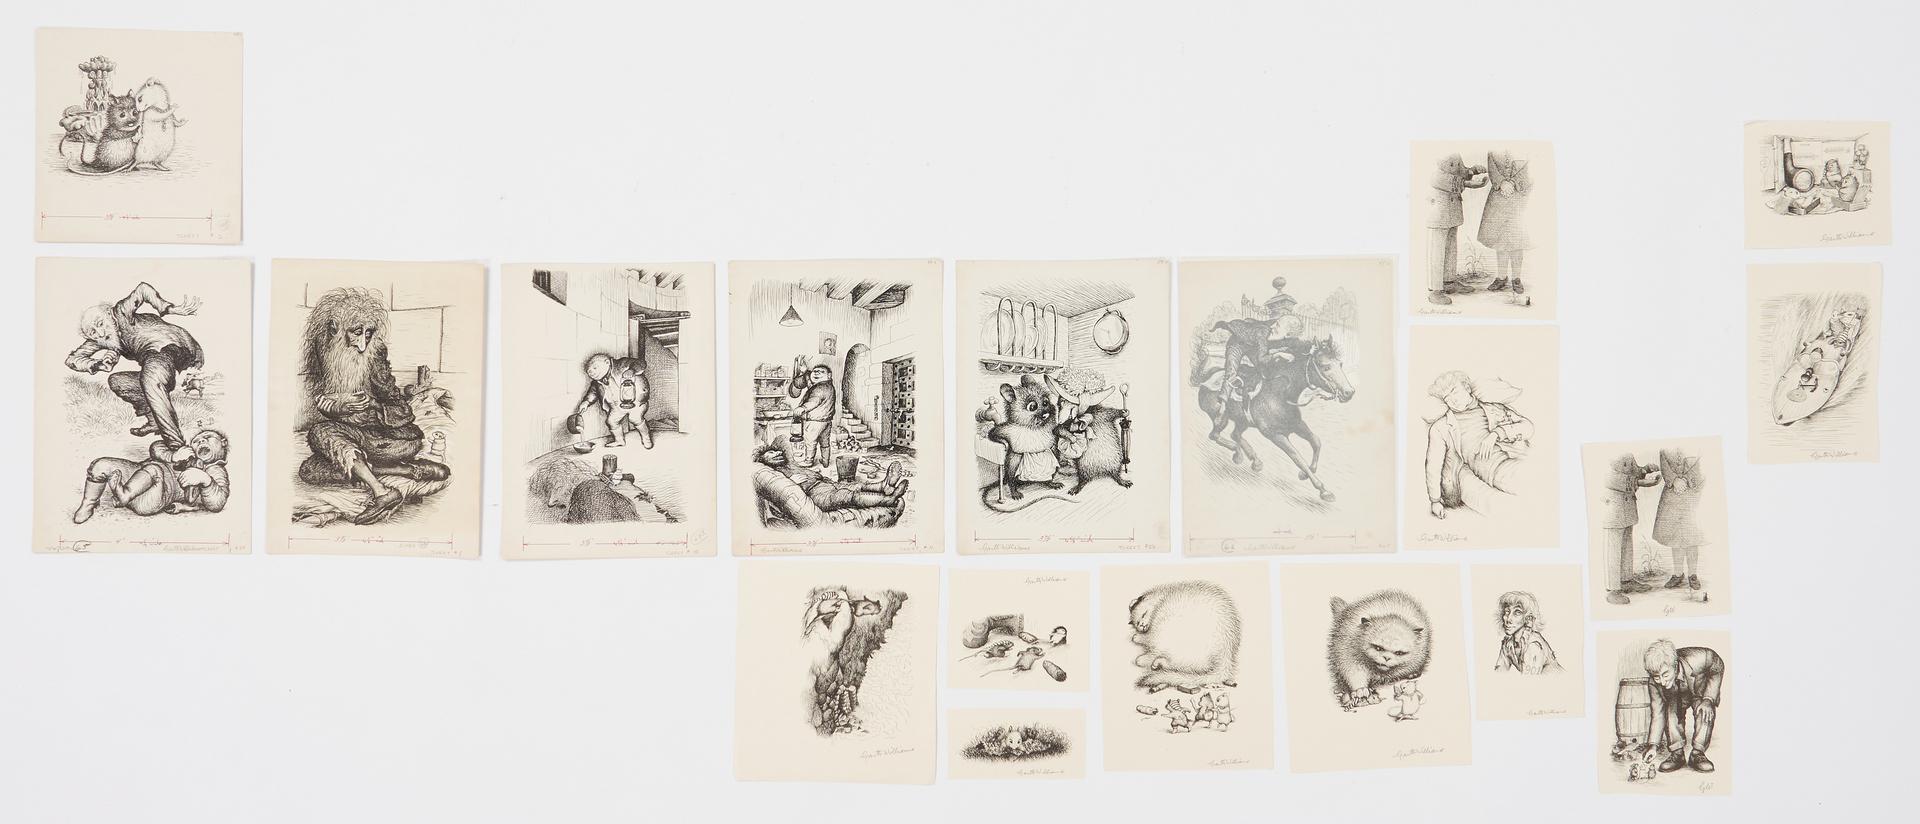 Lot 901: Garth Williams Archive of The Rescuers Books Illus., 87 items